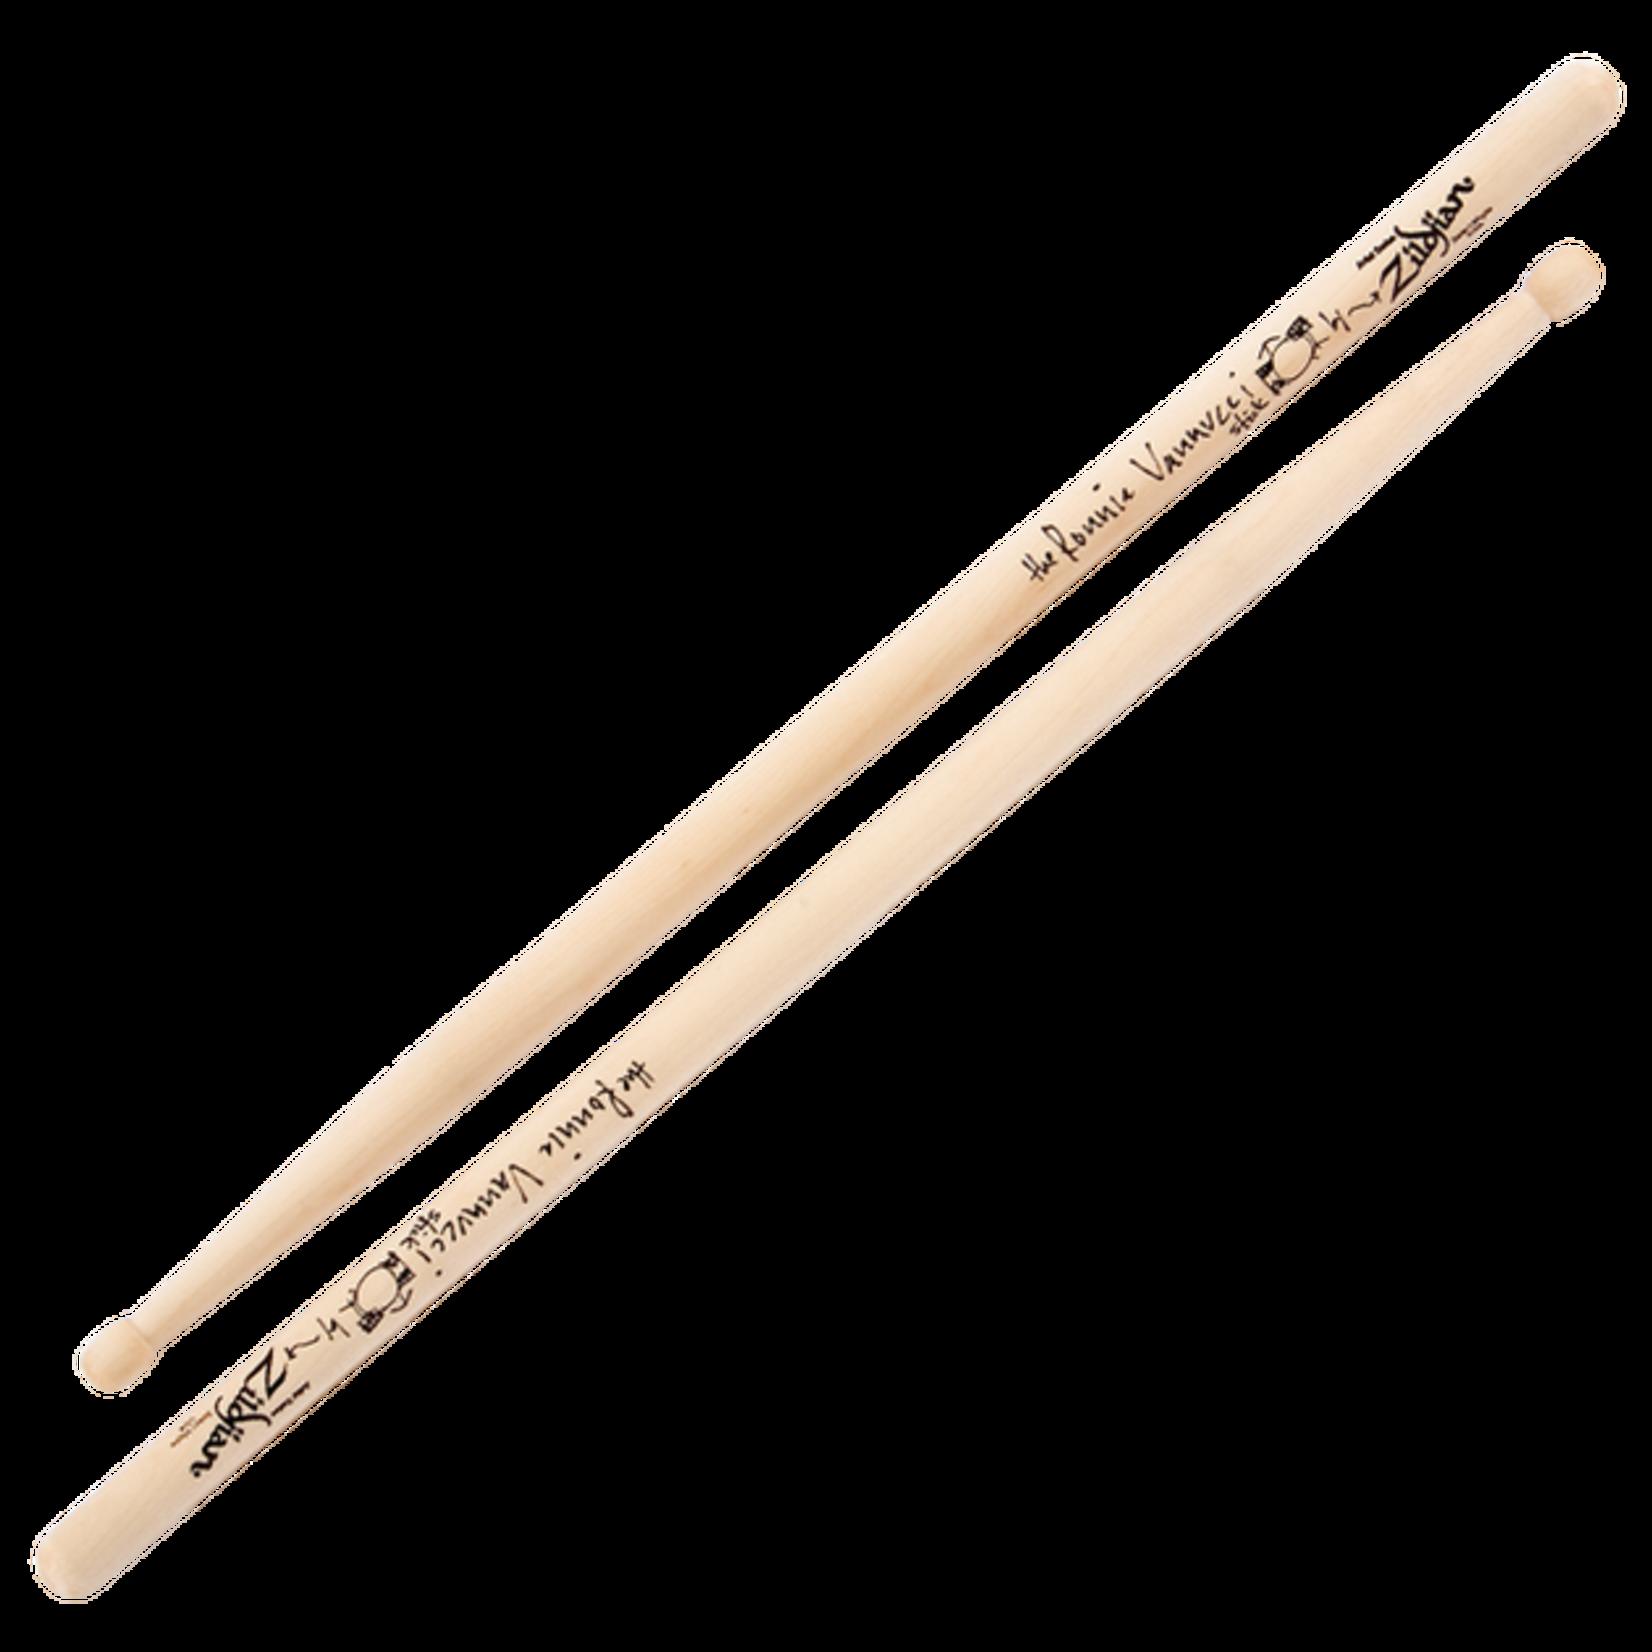 Zildjian Zildjian Ronnie Vannucci Artist Series Drumsticks